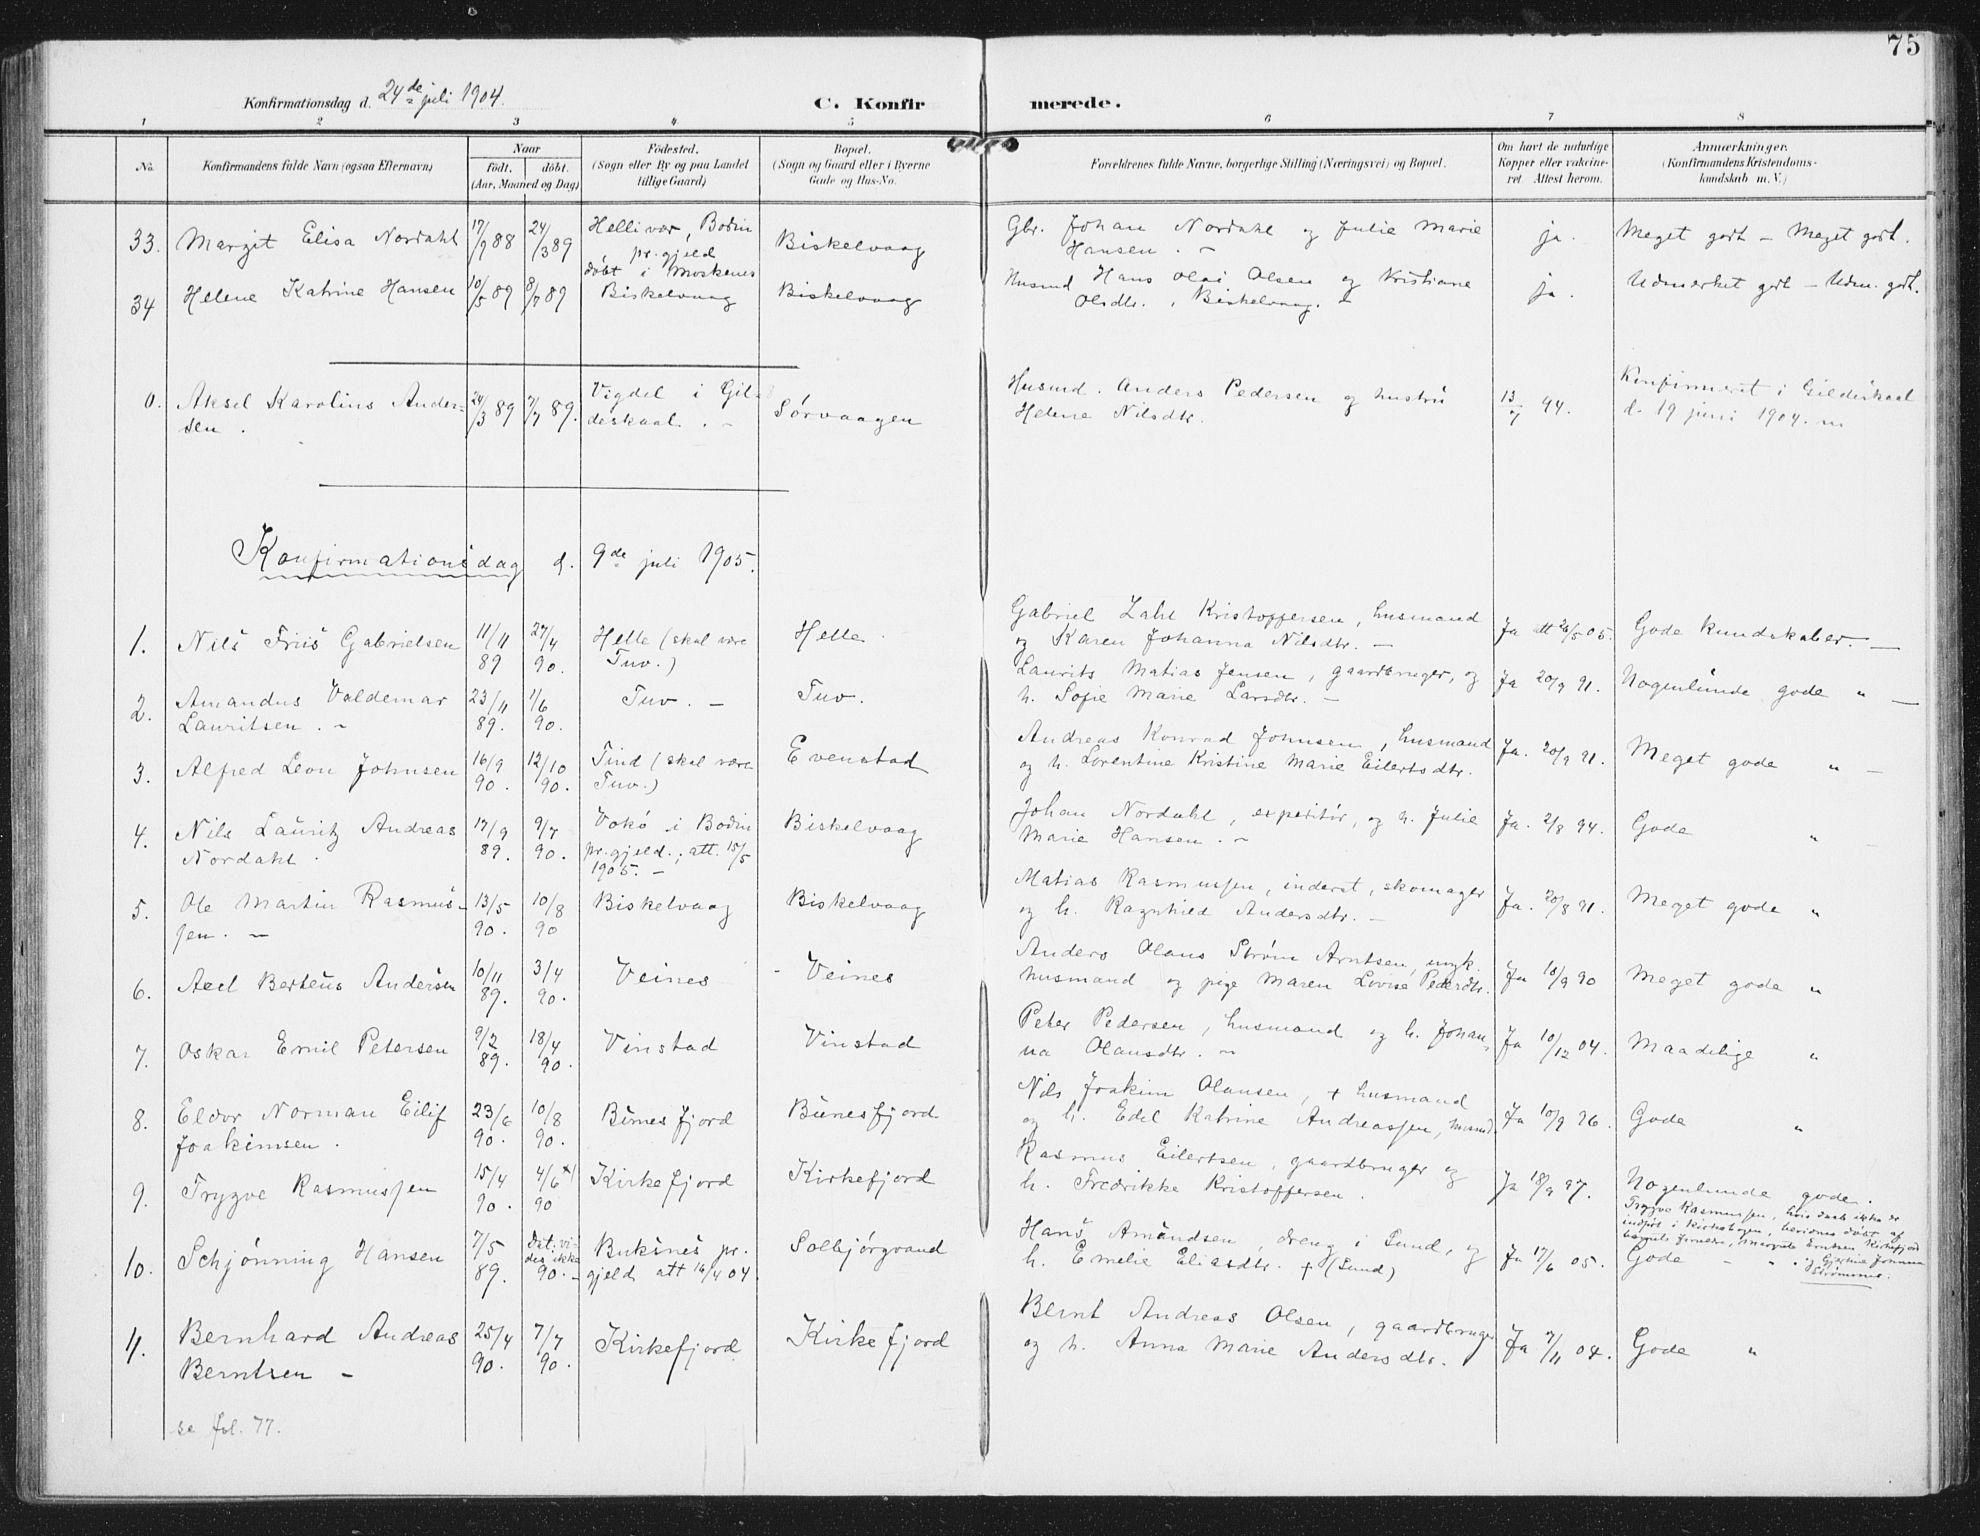 SAT, Ministerialprotokoller, klokkerbøker og fødselsregistre - Nordland, 886/L1221: Ministerialbok nr. 886A03, 1903-1913, s. 75